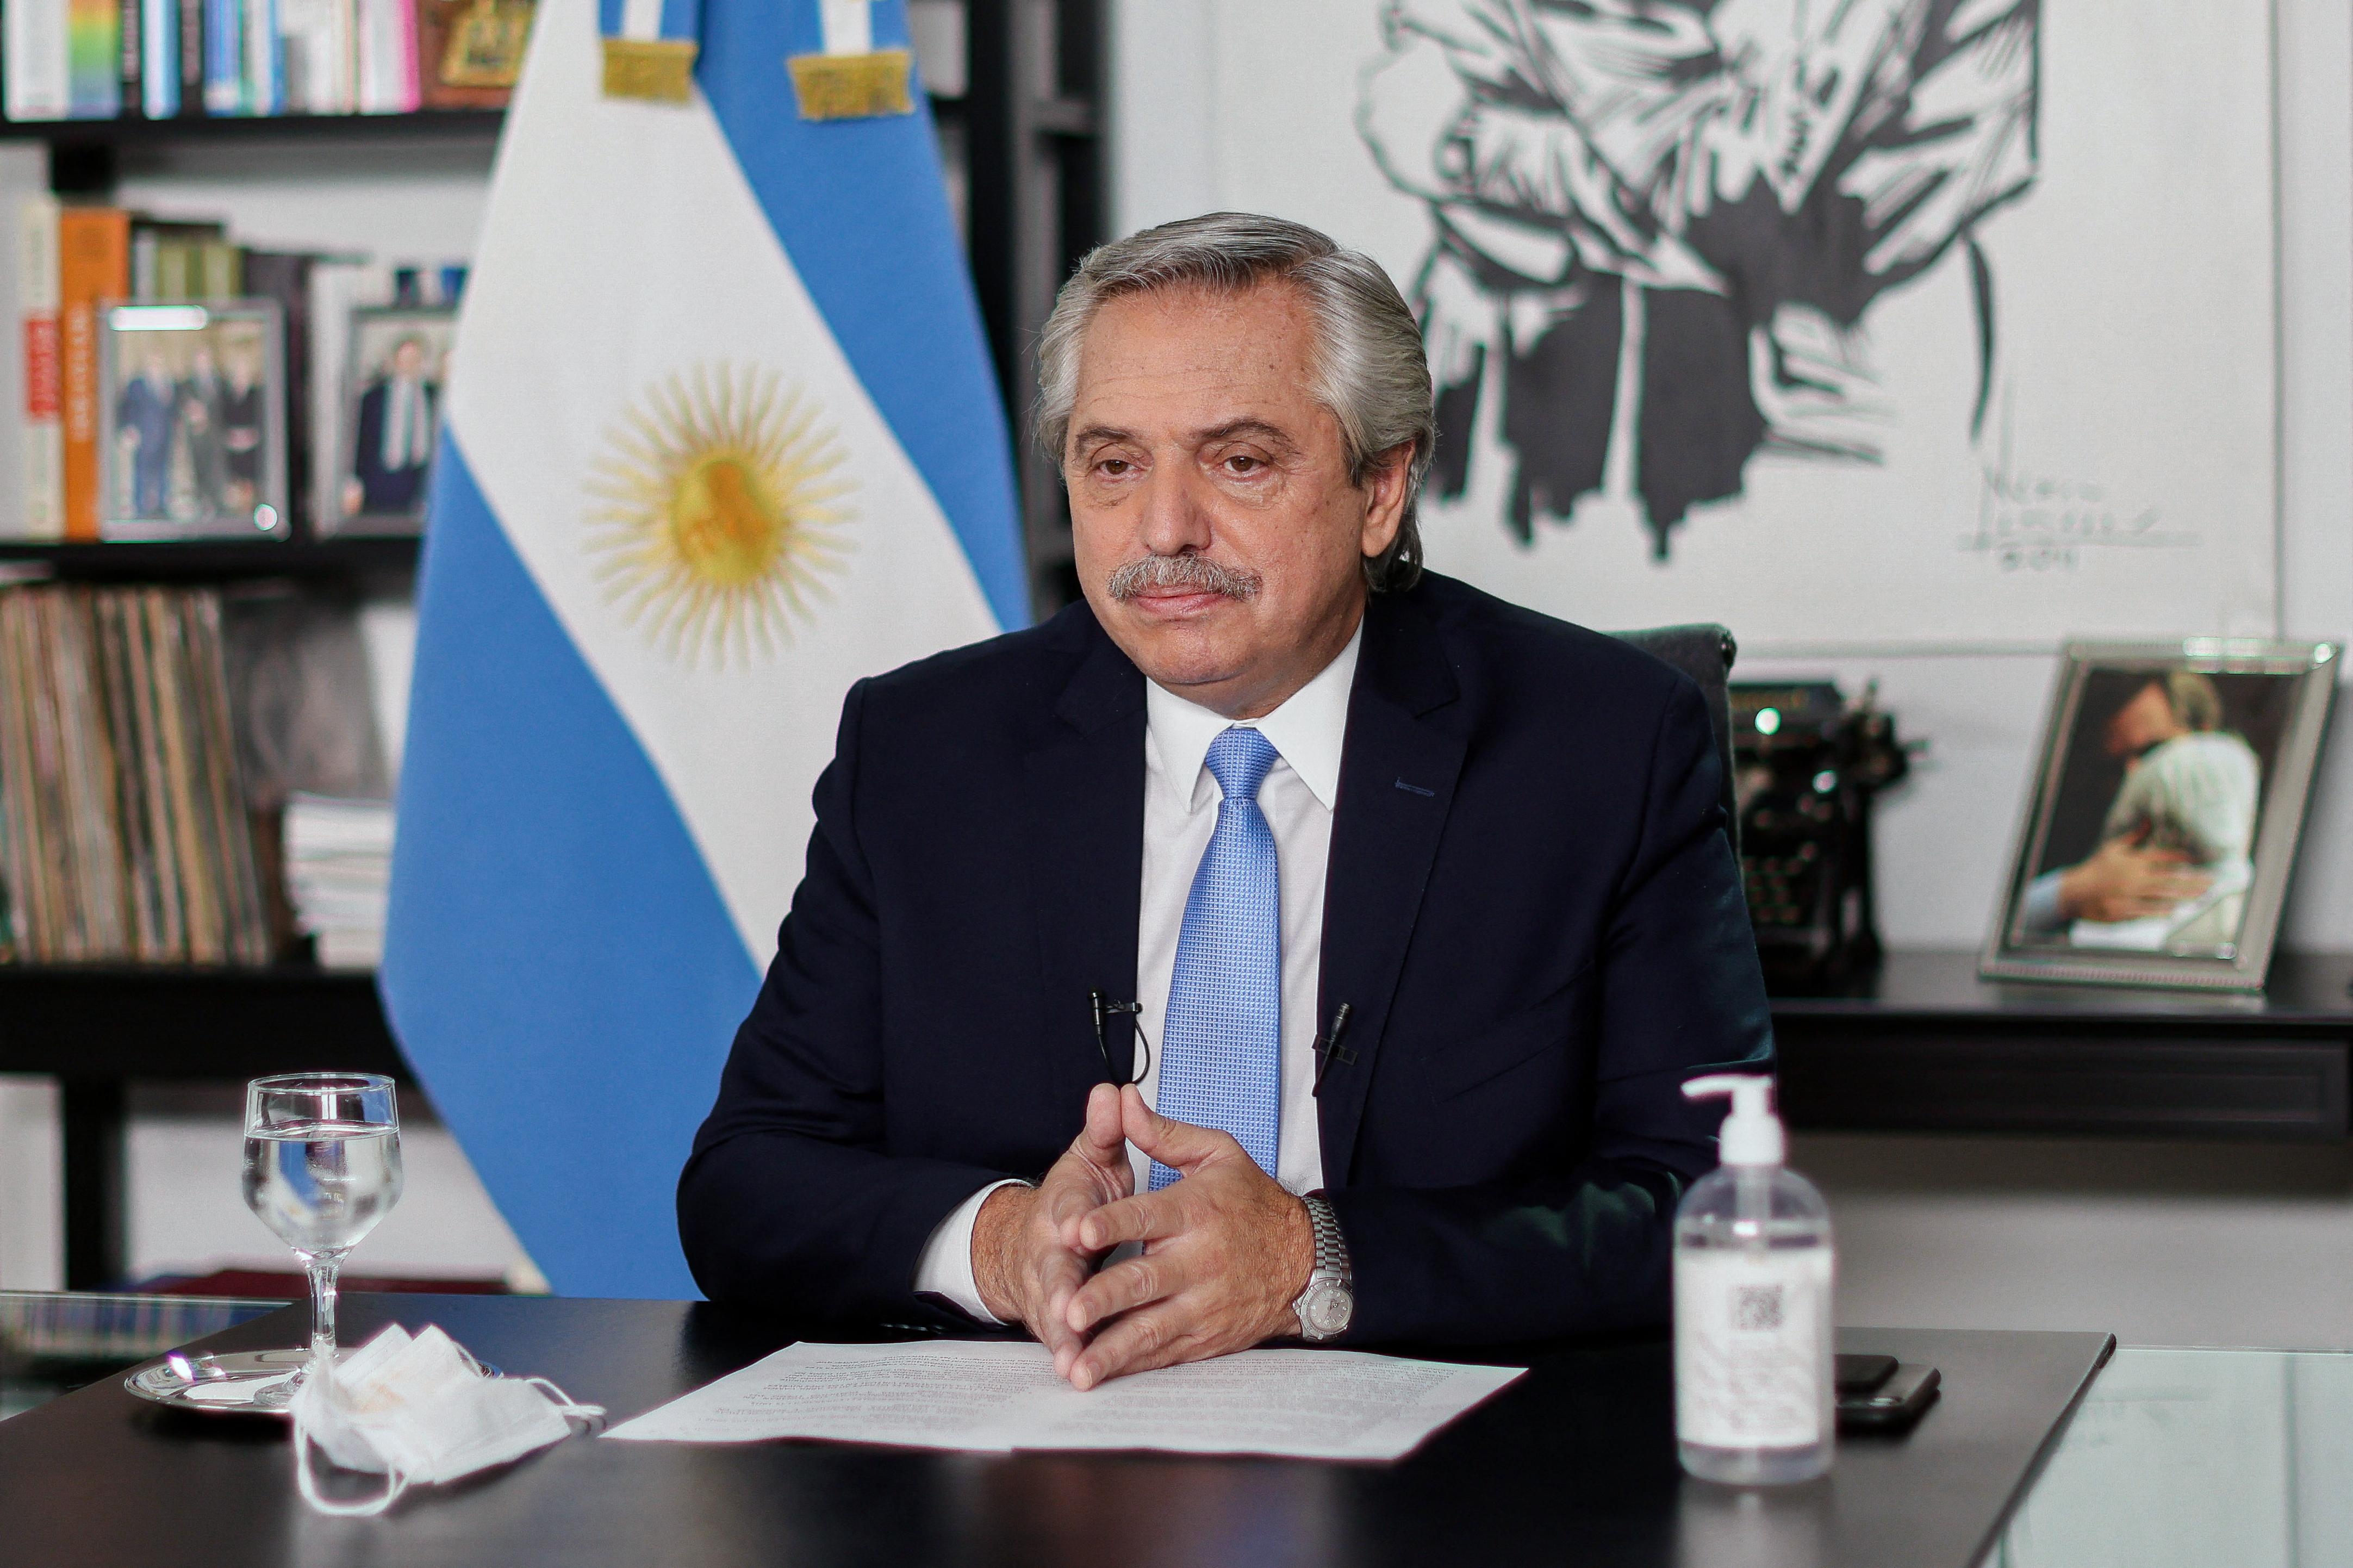 (Foto: ESTEBAN COLLAZO / ARGENTINIAN PRESIDENCY / AFP)